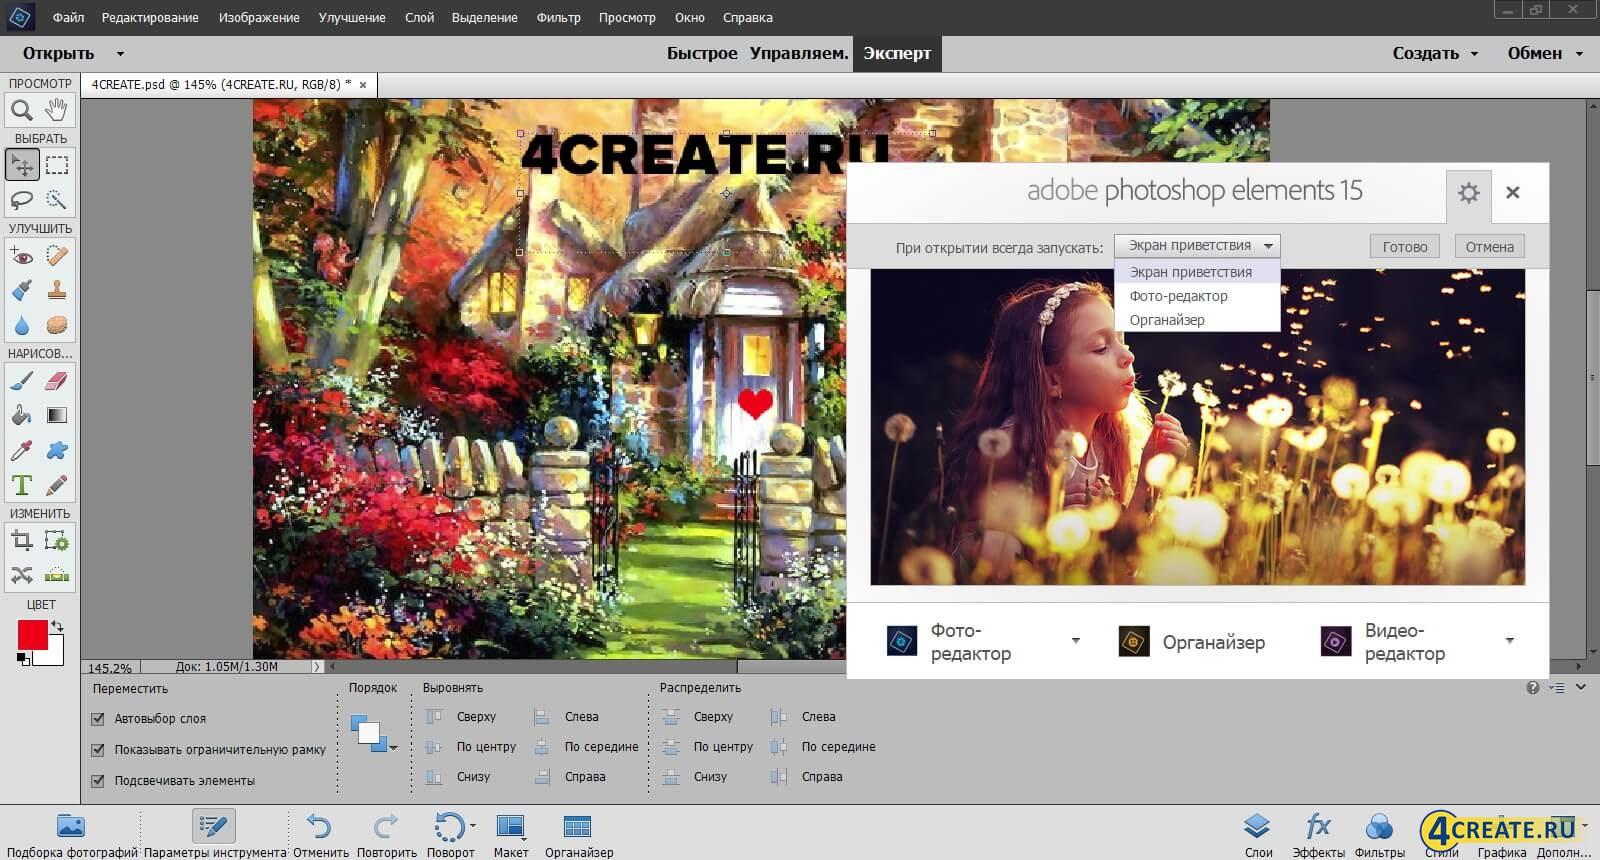 Photoshop Elements 15 (Скриншот 1)